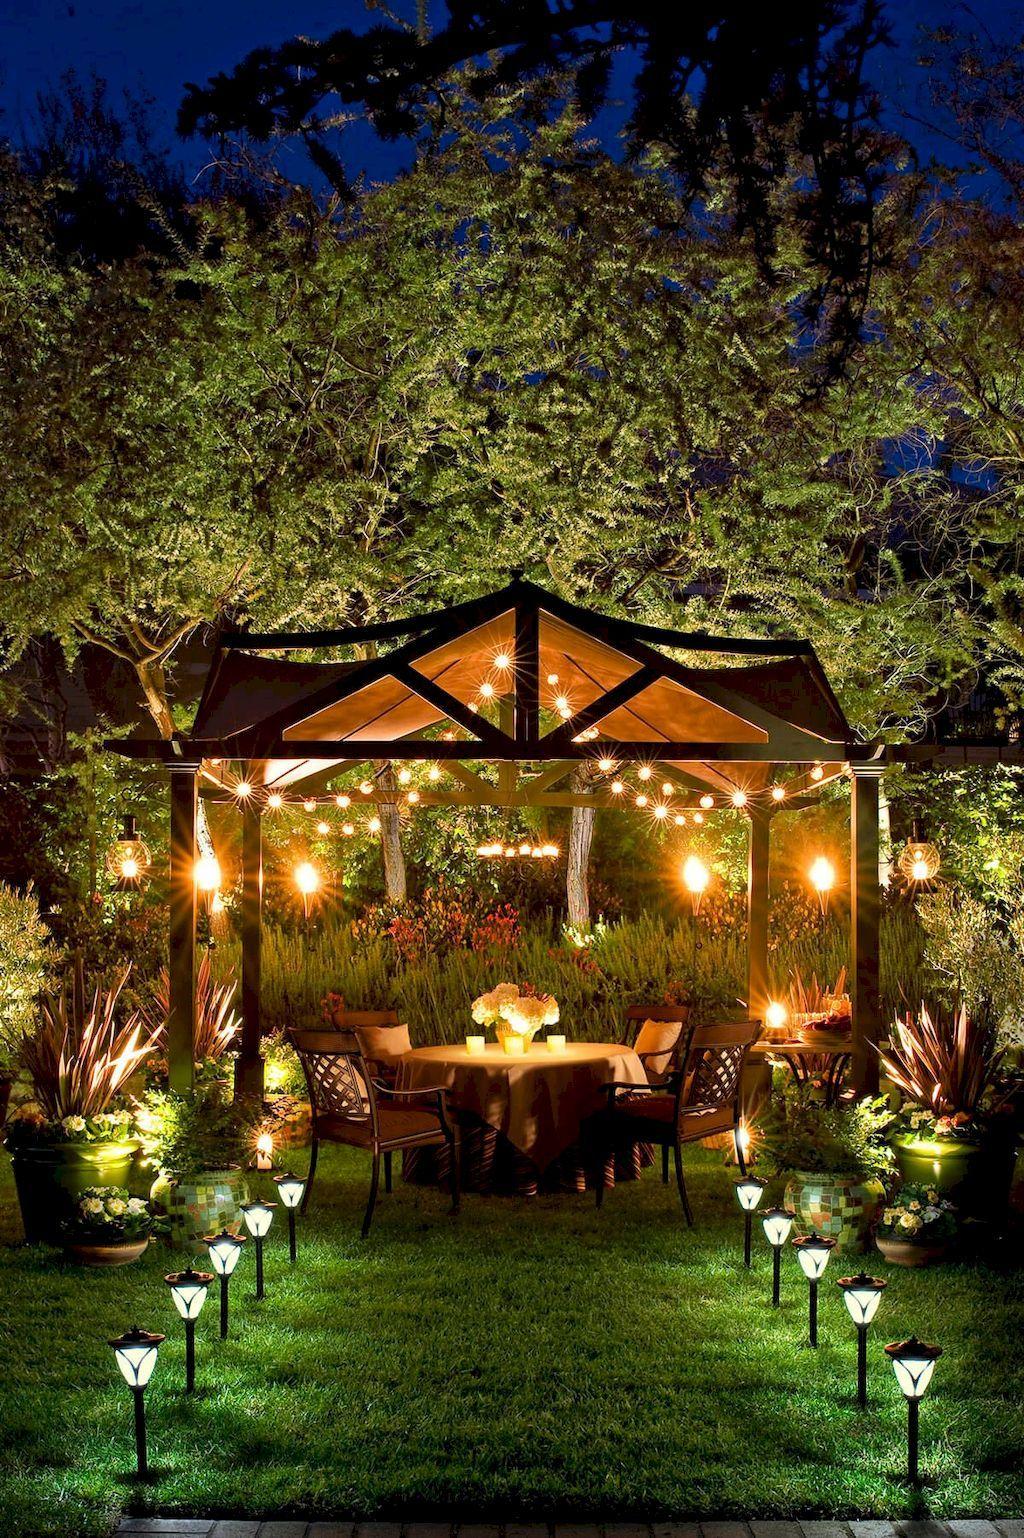 Awesome Gazebo Backyard Ideas Javgohome Home Inspiration Backyard Ideas For Small Yards Diy Backyard Landscaping Backyard Lighting